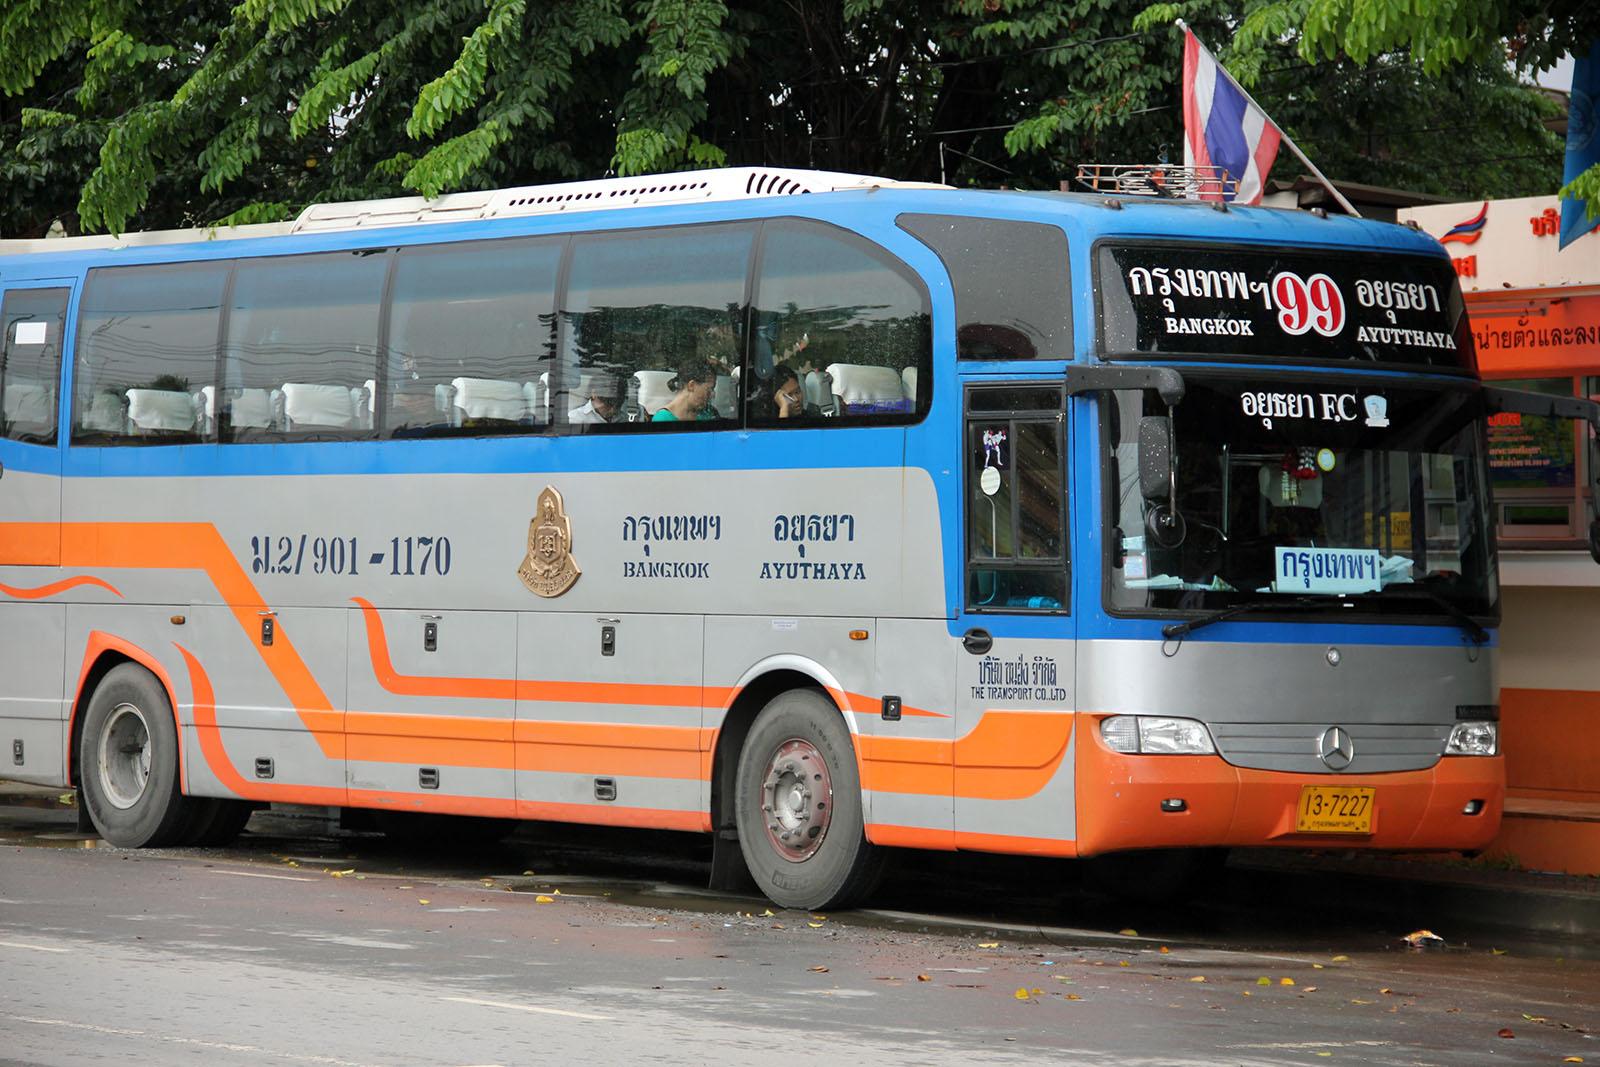 http://3.bp.blogspot.com/-nCGdpxADP6E/UOnMFSUmtLI/AAAAAAAAJVo/xv2-Jak6z3o/s1600/Bus-Bangkok-Ayutthaya.JPG